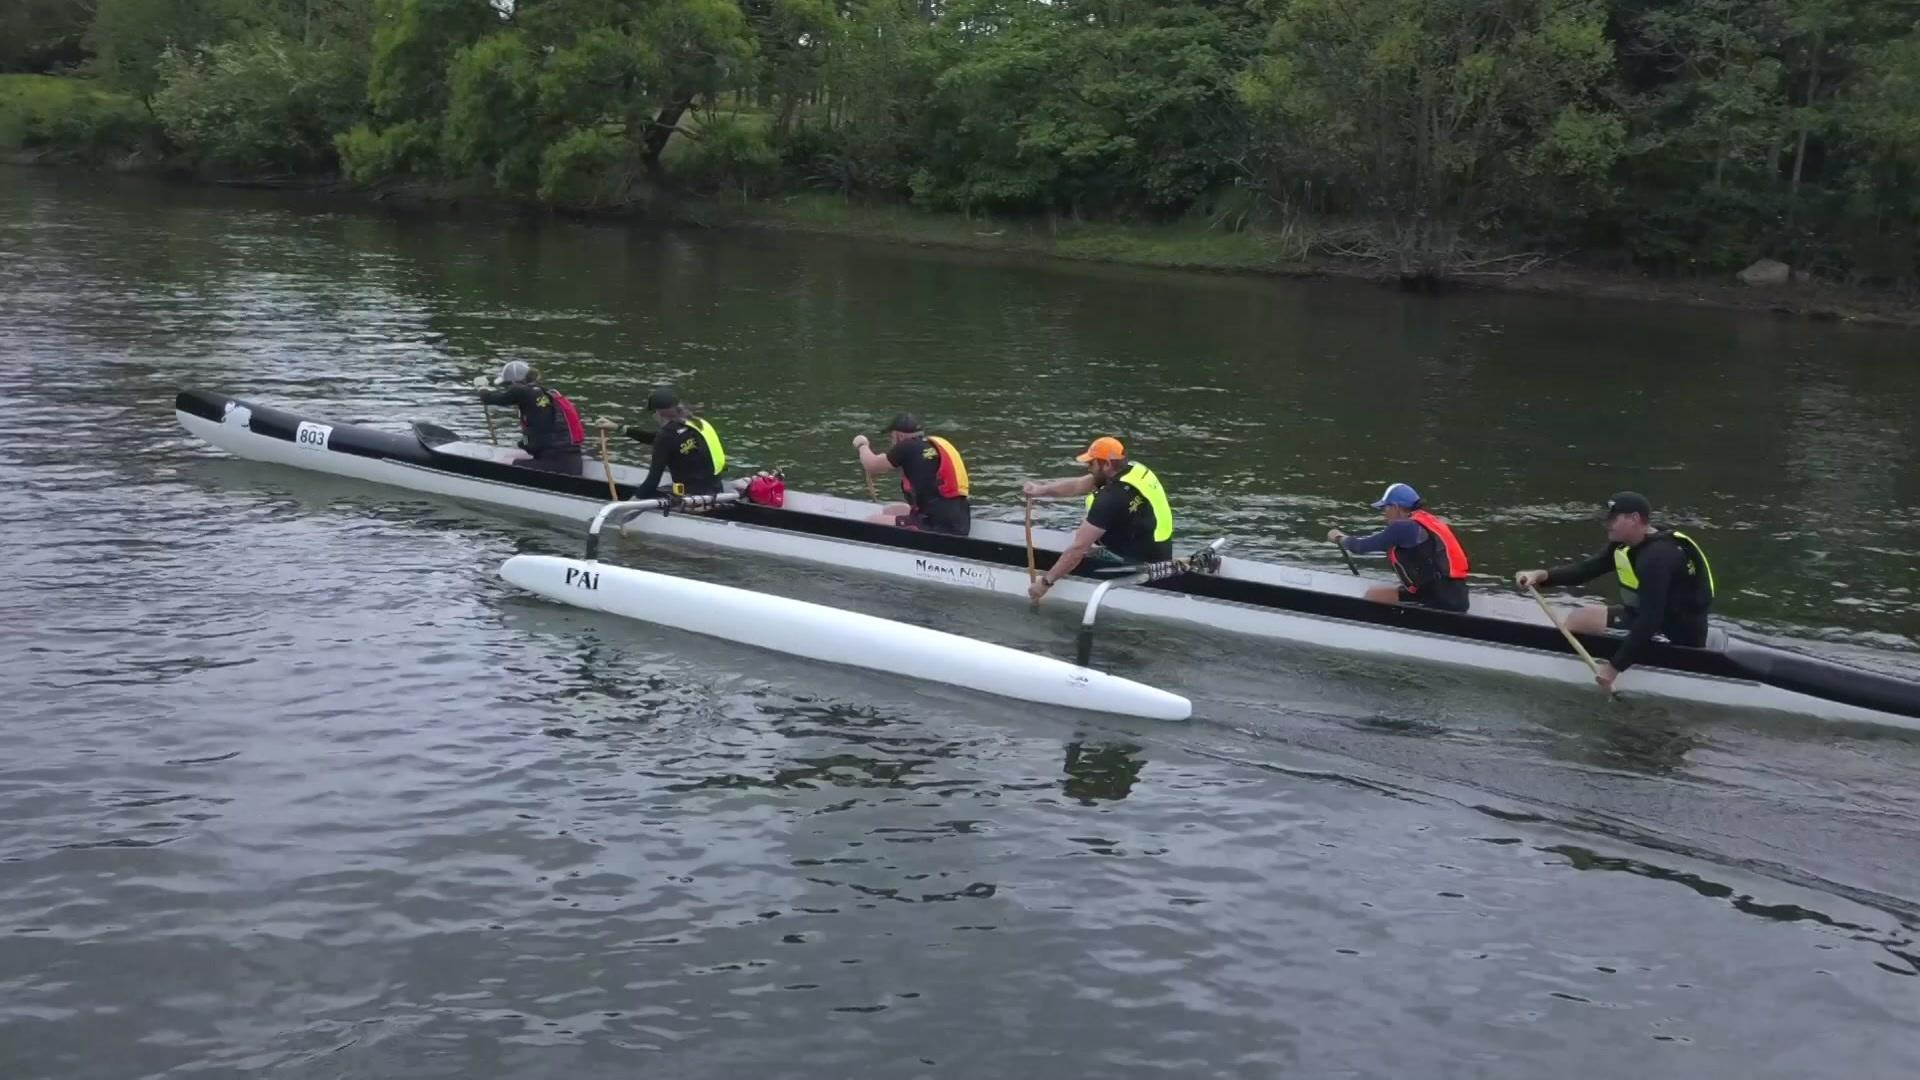 Video for Waka race 100kms down Waikato River